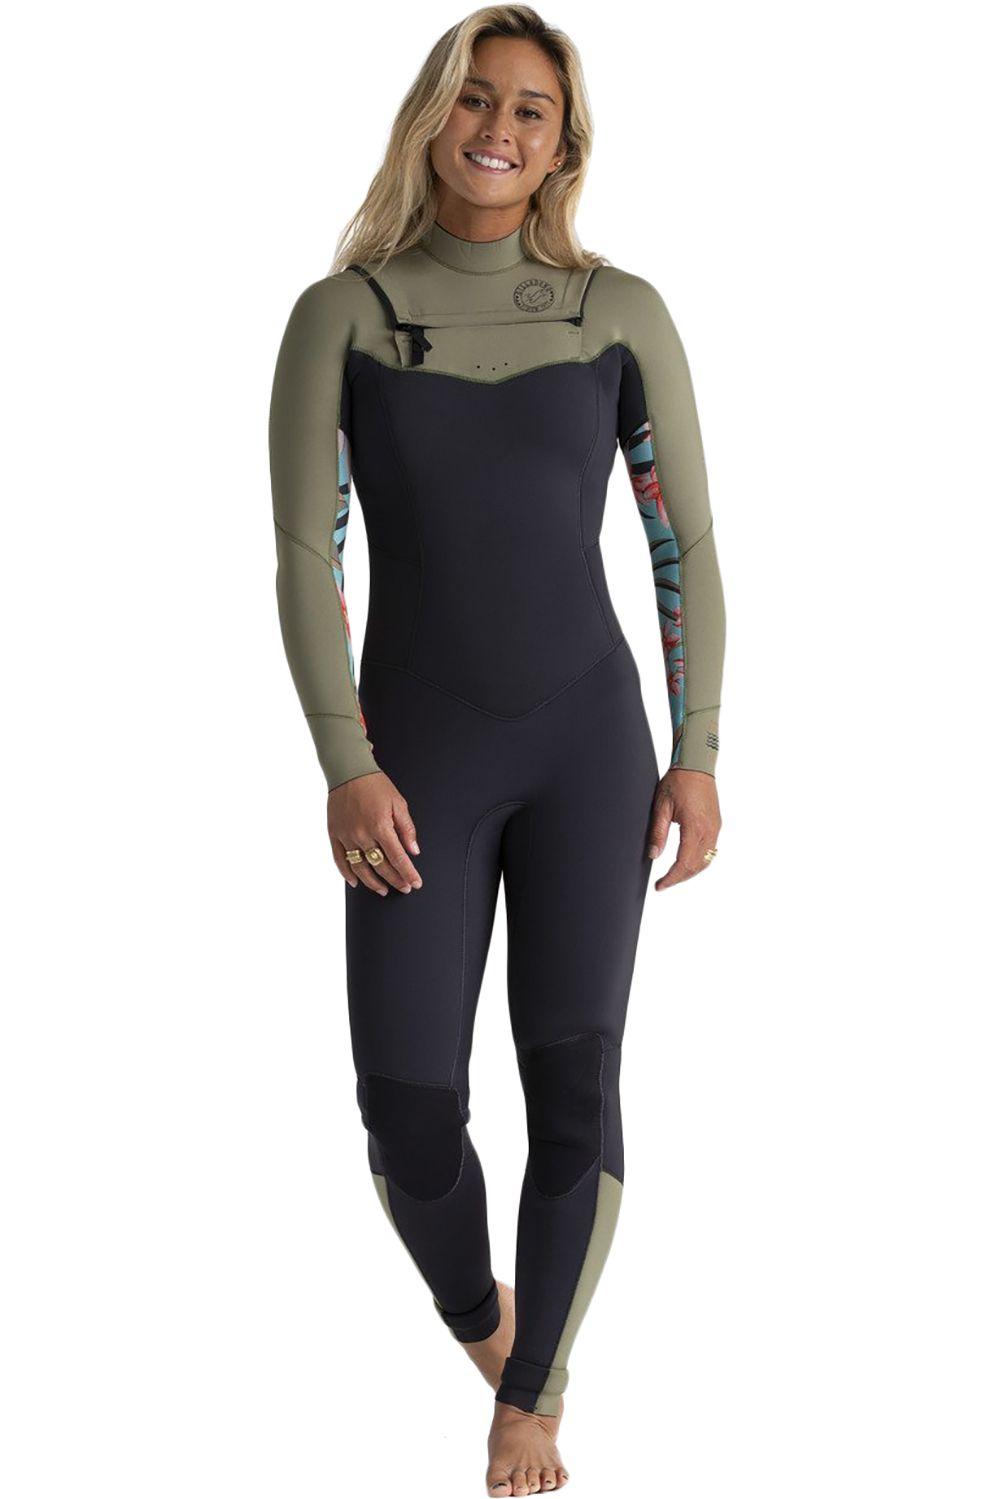 Billabong Wetsuit SALTY DAYZ FULL 302 SURF CAPSULE Aloe 3x2mm